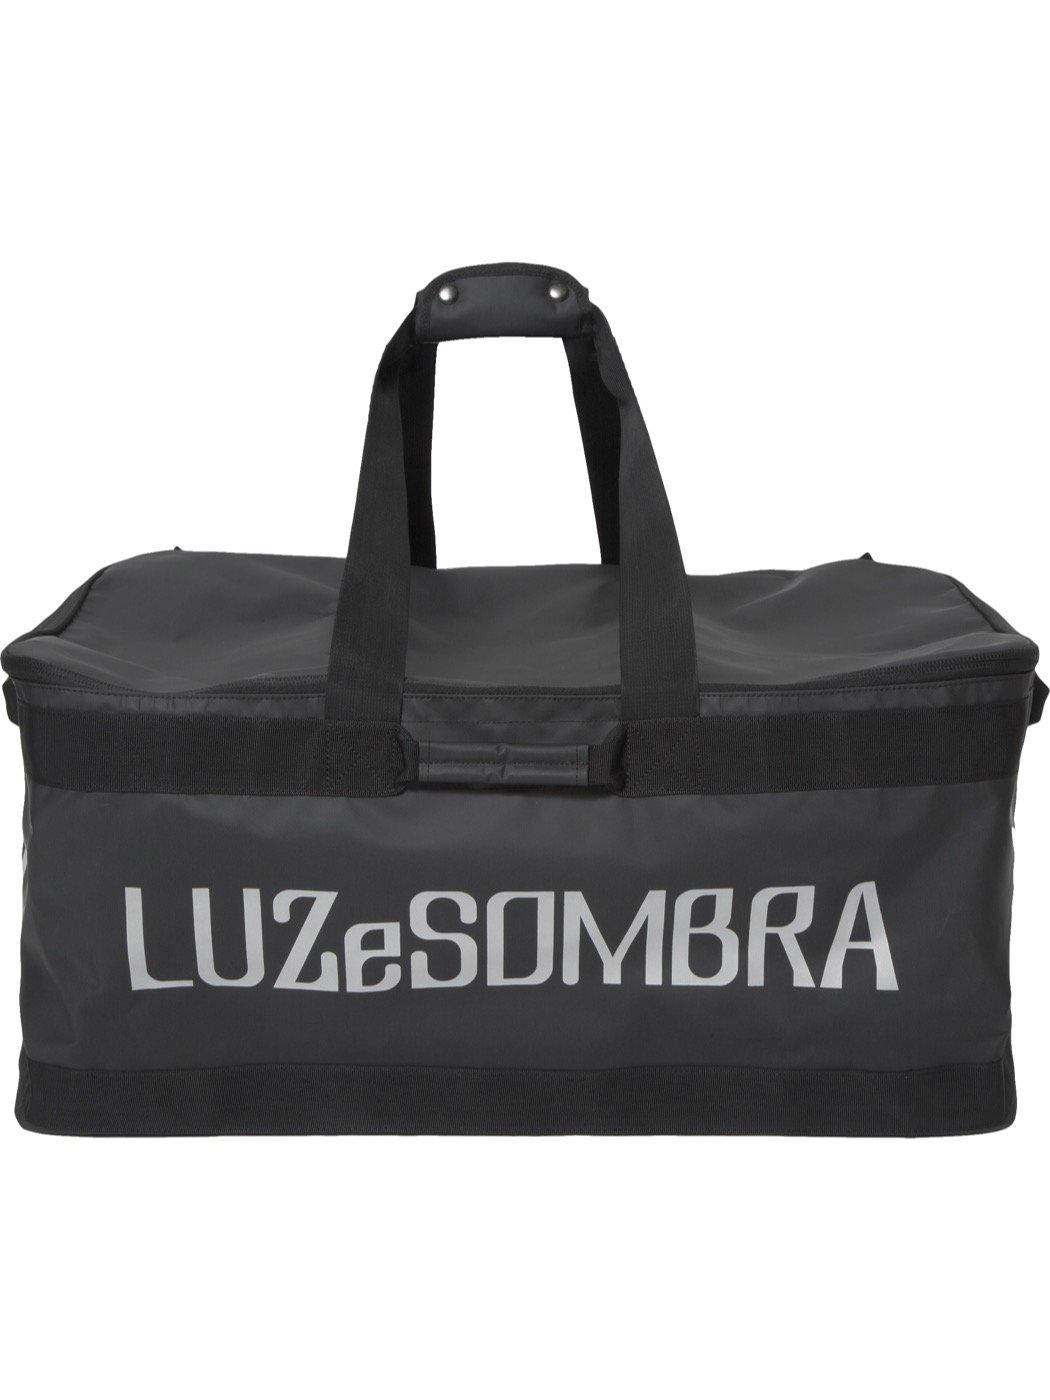 LUZeSOMBRA(ルースイソンブラ) LS CONTAINER BAG F1814713 B07CKH4LBRブラック F